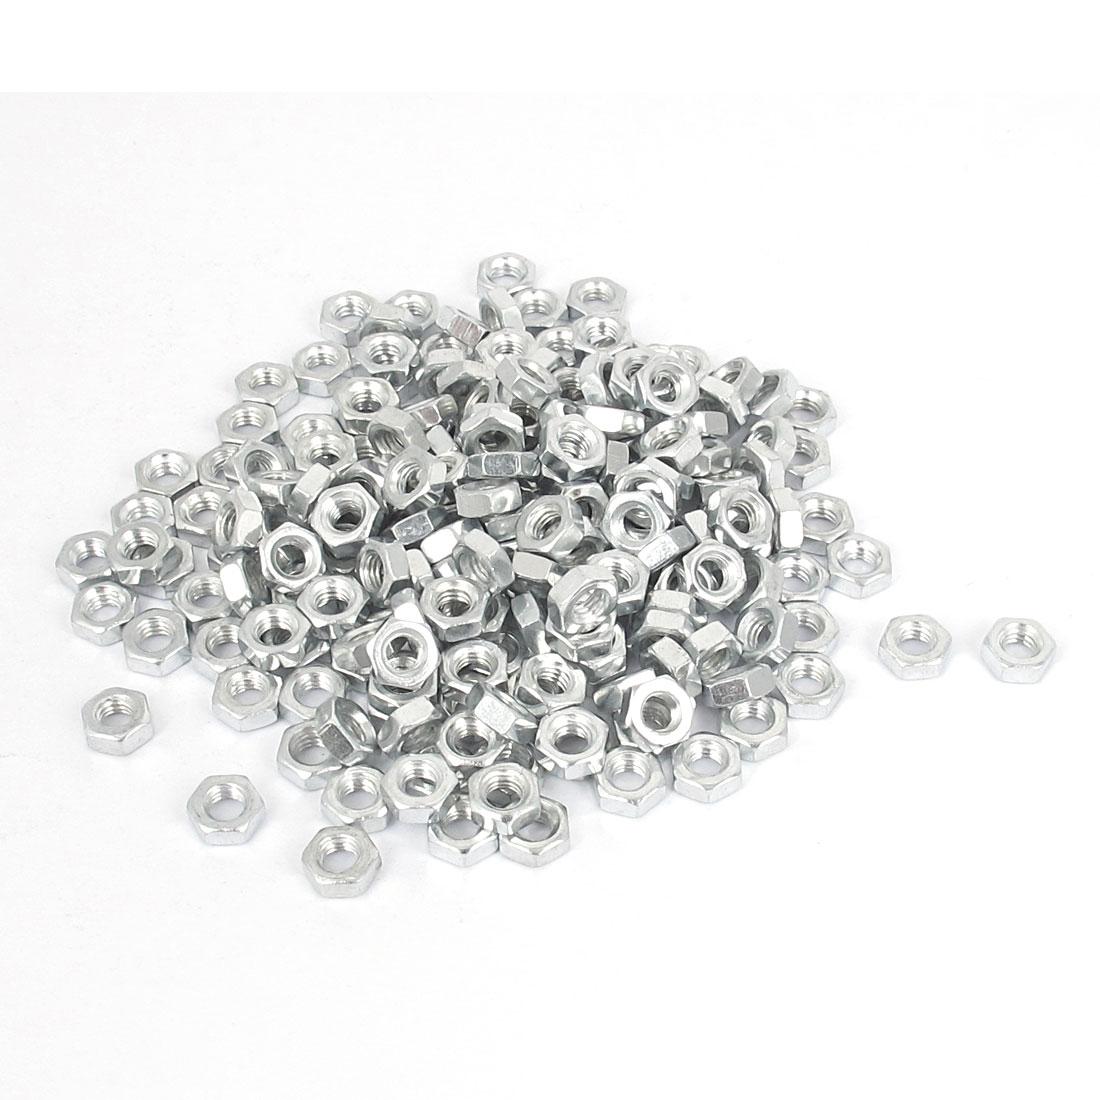 200 Pcs M4 Metal Machine Screw Hex Hexagon Nut DIN 934